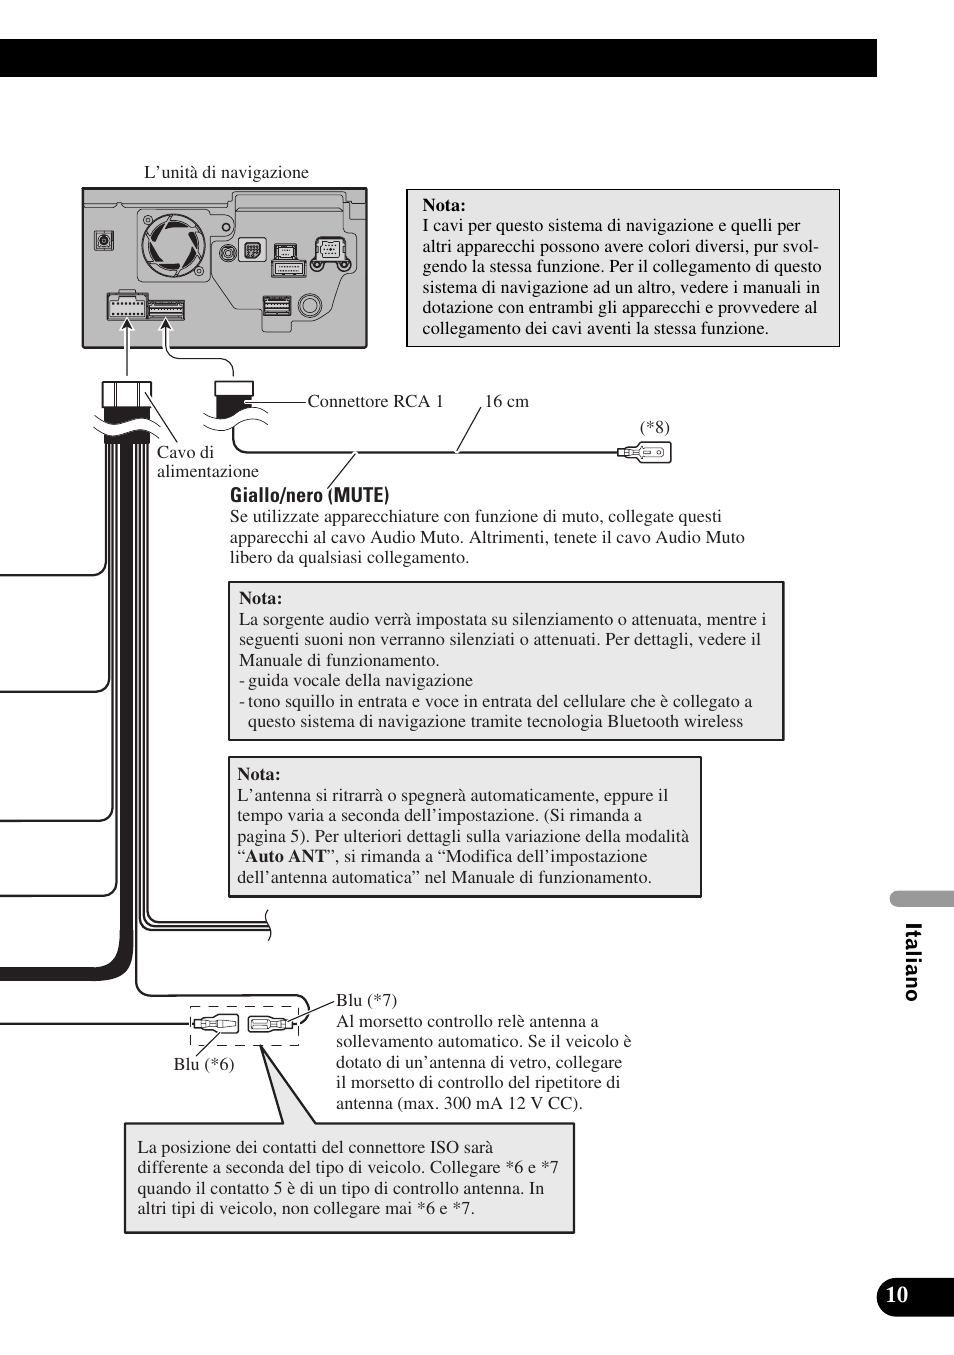 pioneer avic hd3 user manual page 131 181 original mode also rh manualsdir com Nero 6 Serial Number Nero Express 6.6